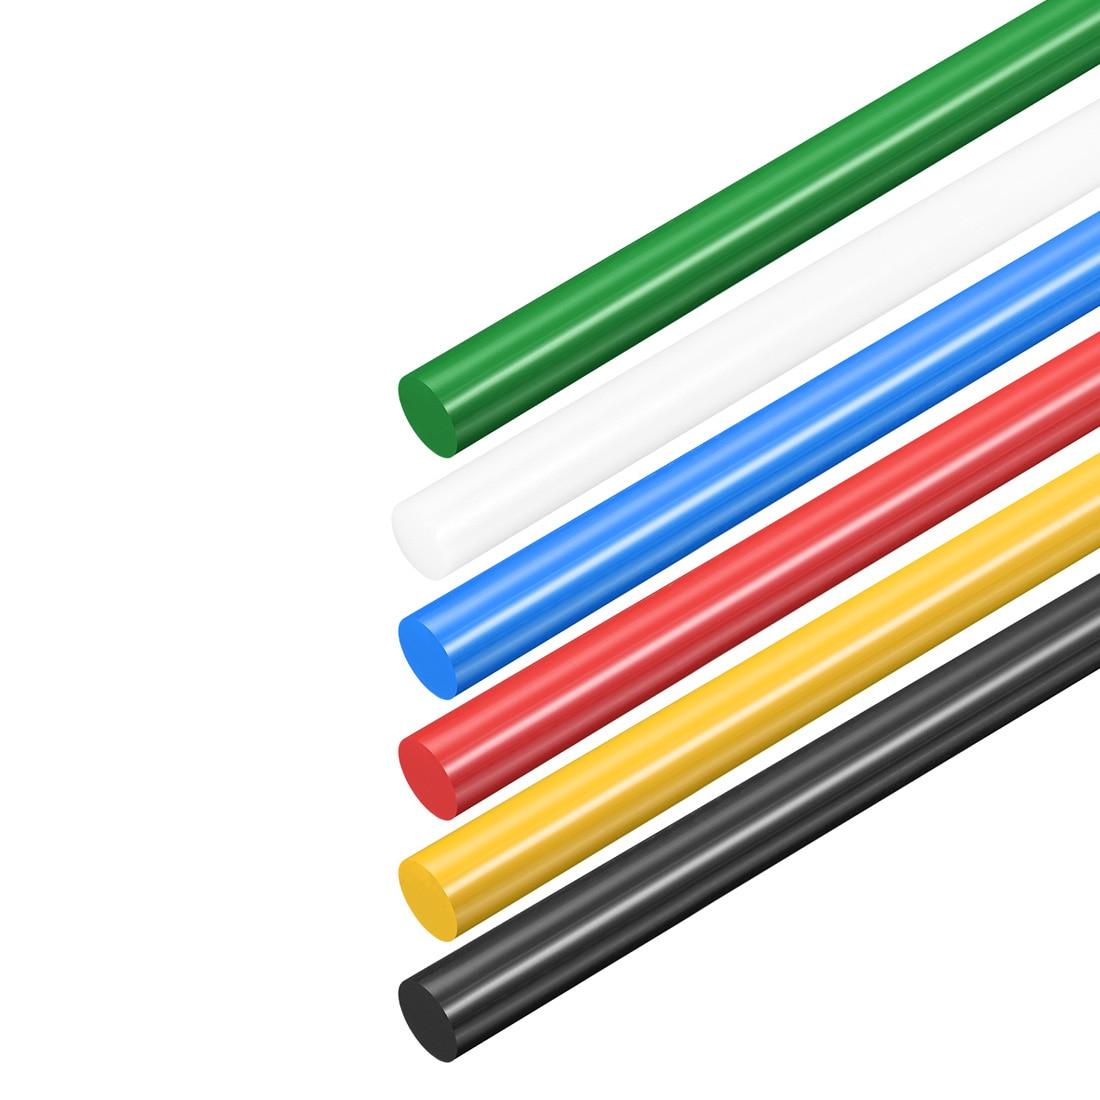 Uxcell 1Pcs 2Pcs 3Pcs Plastic Round Rod Polyoxymethylene Rods 6mm Dia 50cm Length Engineering Plastic Round Bar Tough Stable